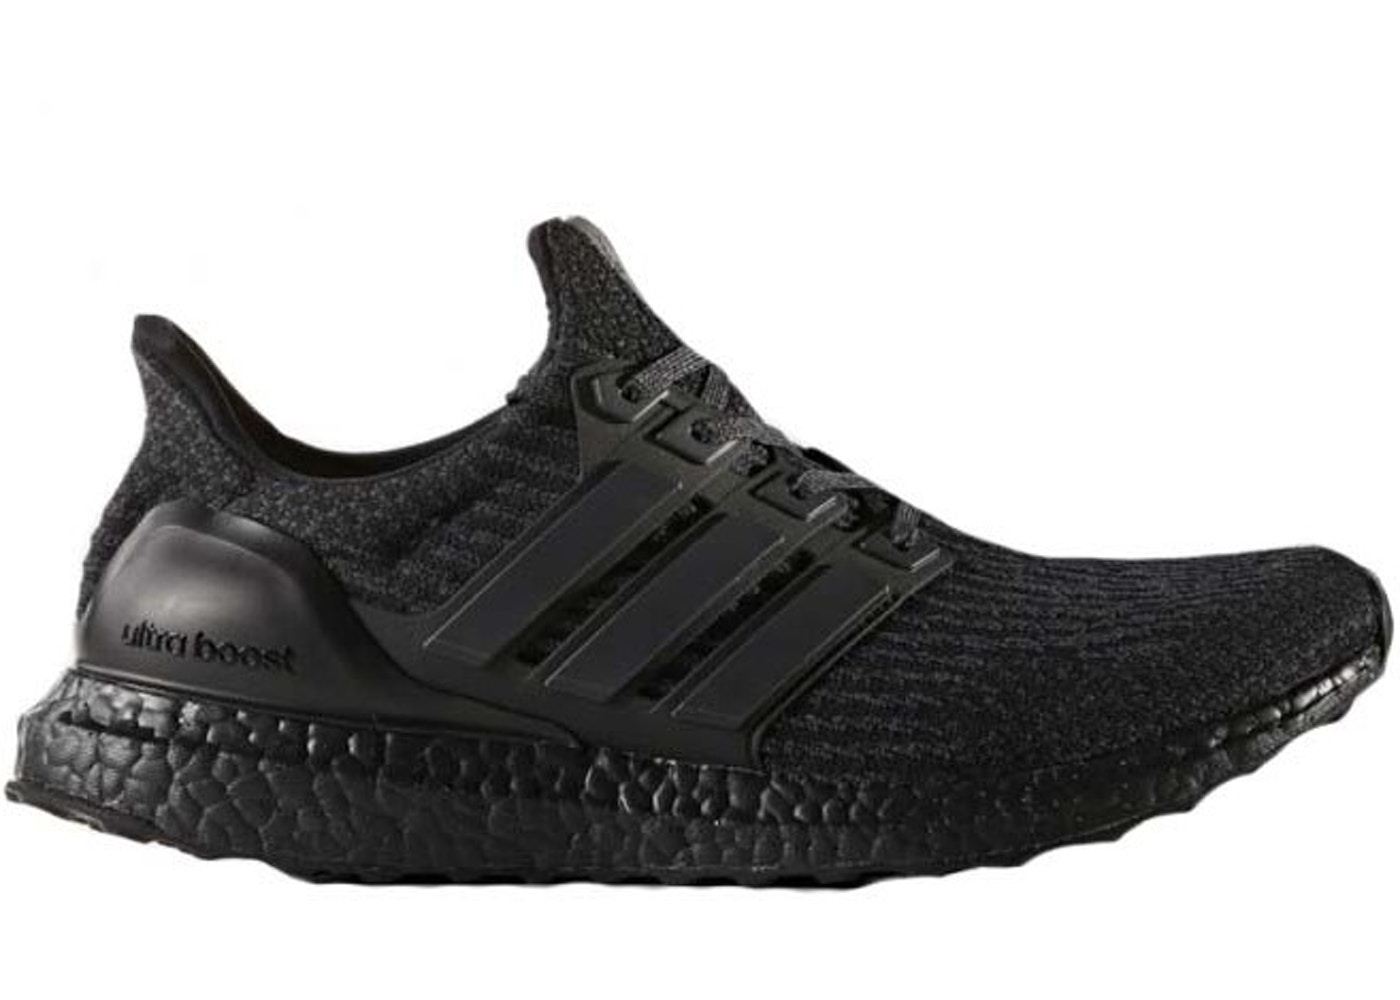 02f7cf5cfb4 adidas Ultra Boost 3.0 Triple Black - BA8920